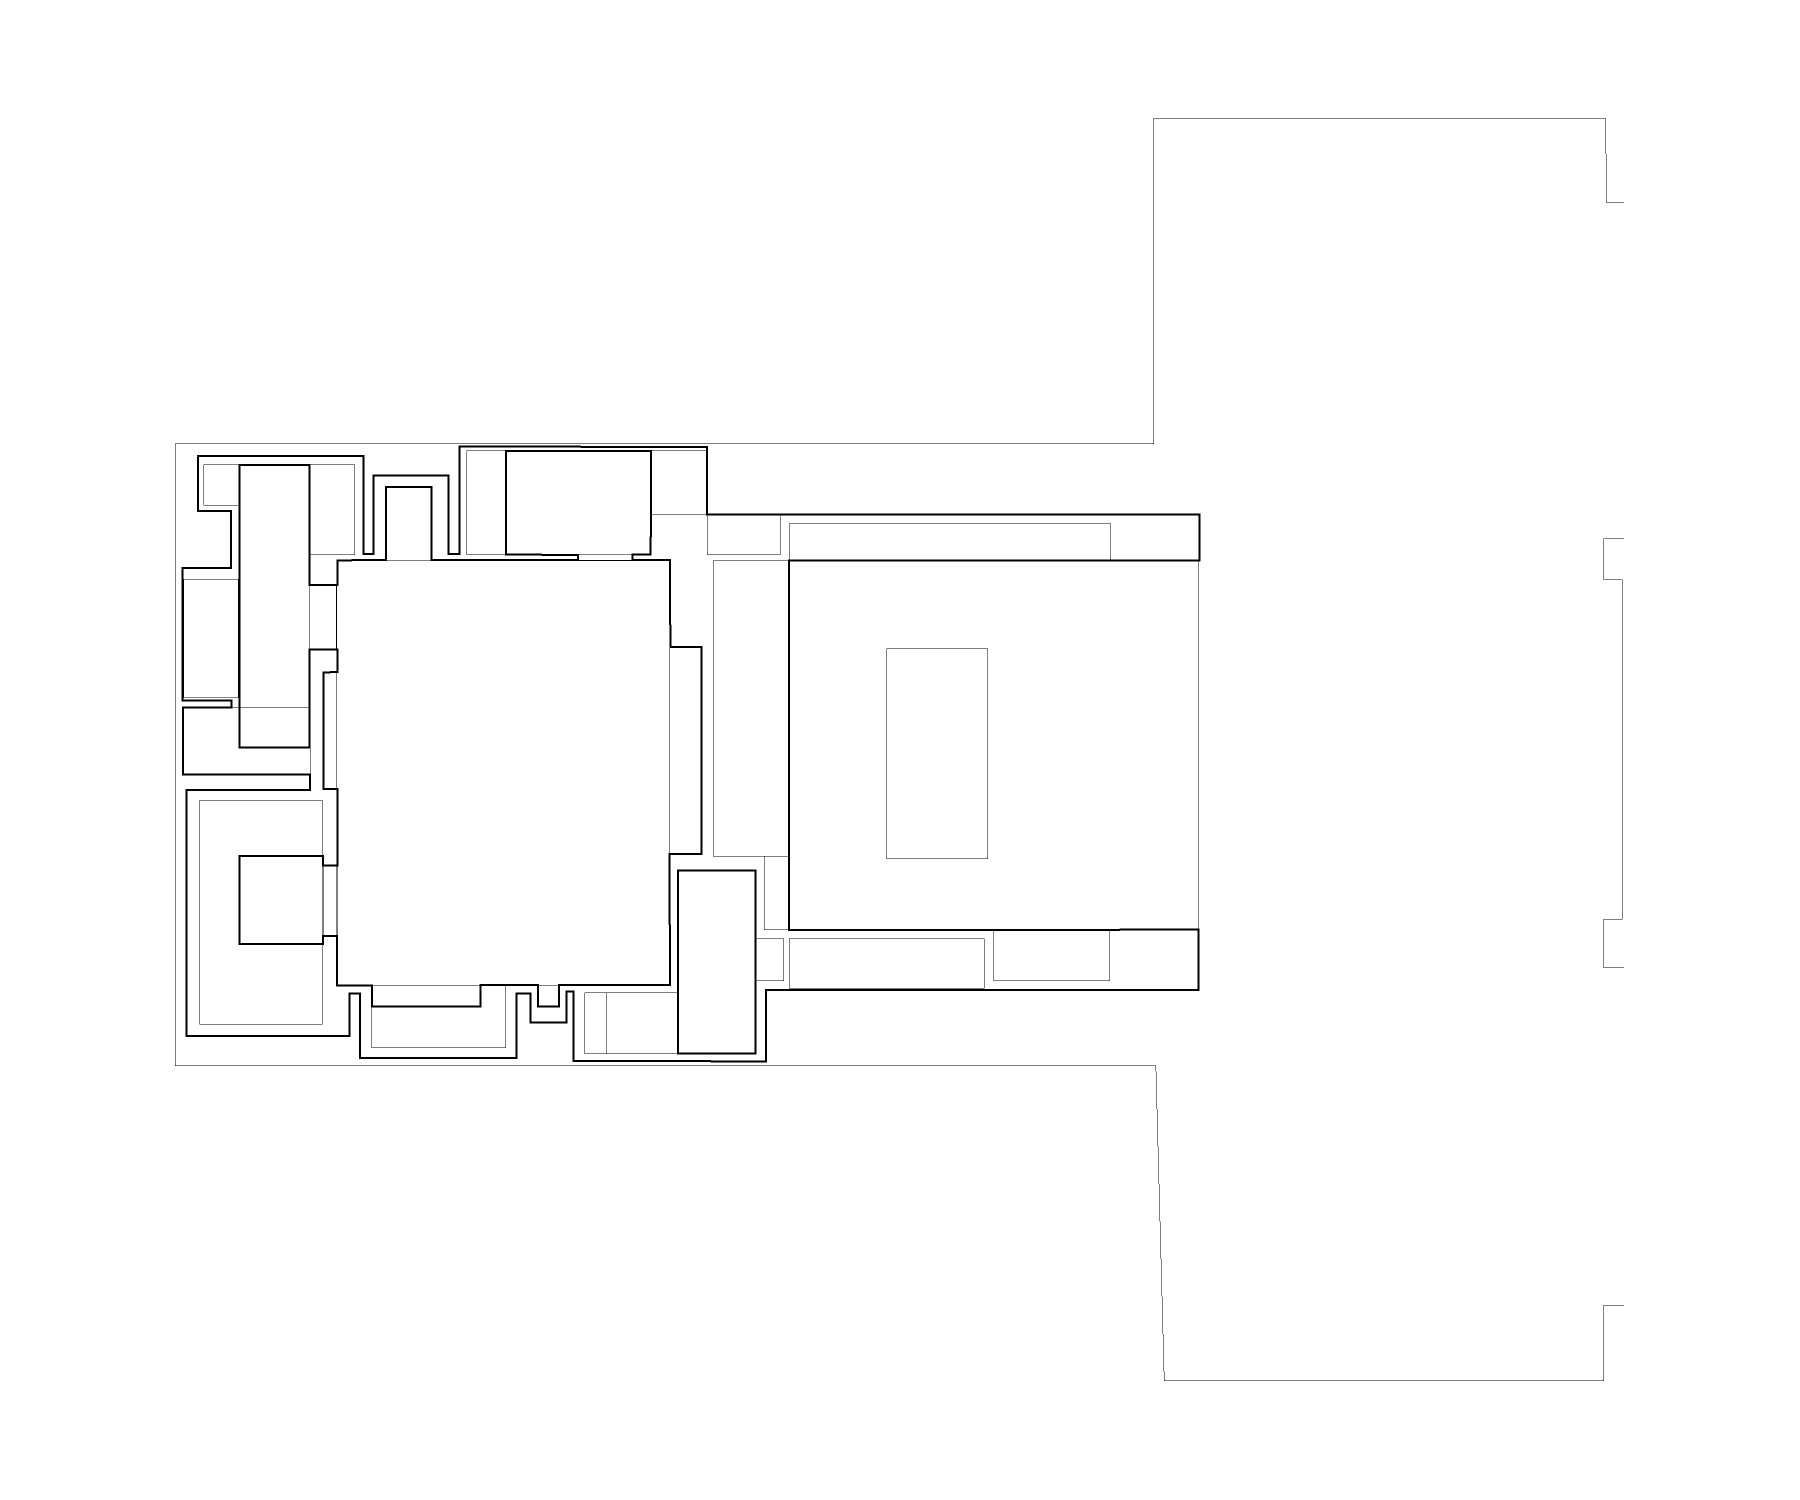 02 u loft row 02 image 01.jpg